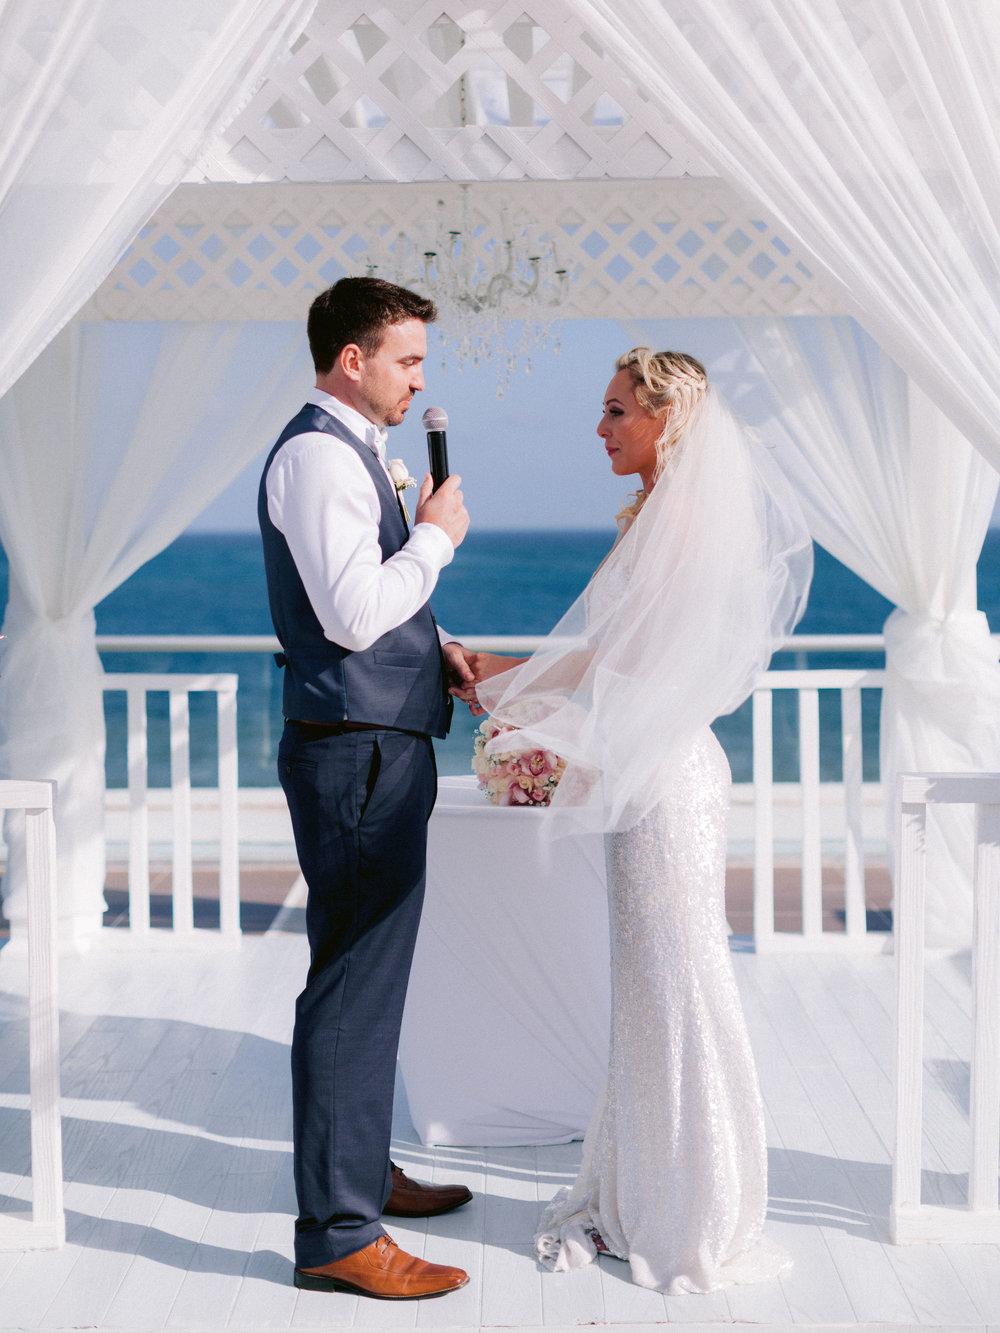 Kim_Jeff_Cancun Wedding_Ceremony_Kurtz_Orpia (75 of 119).jpg